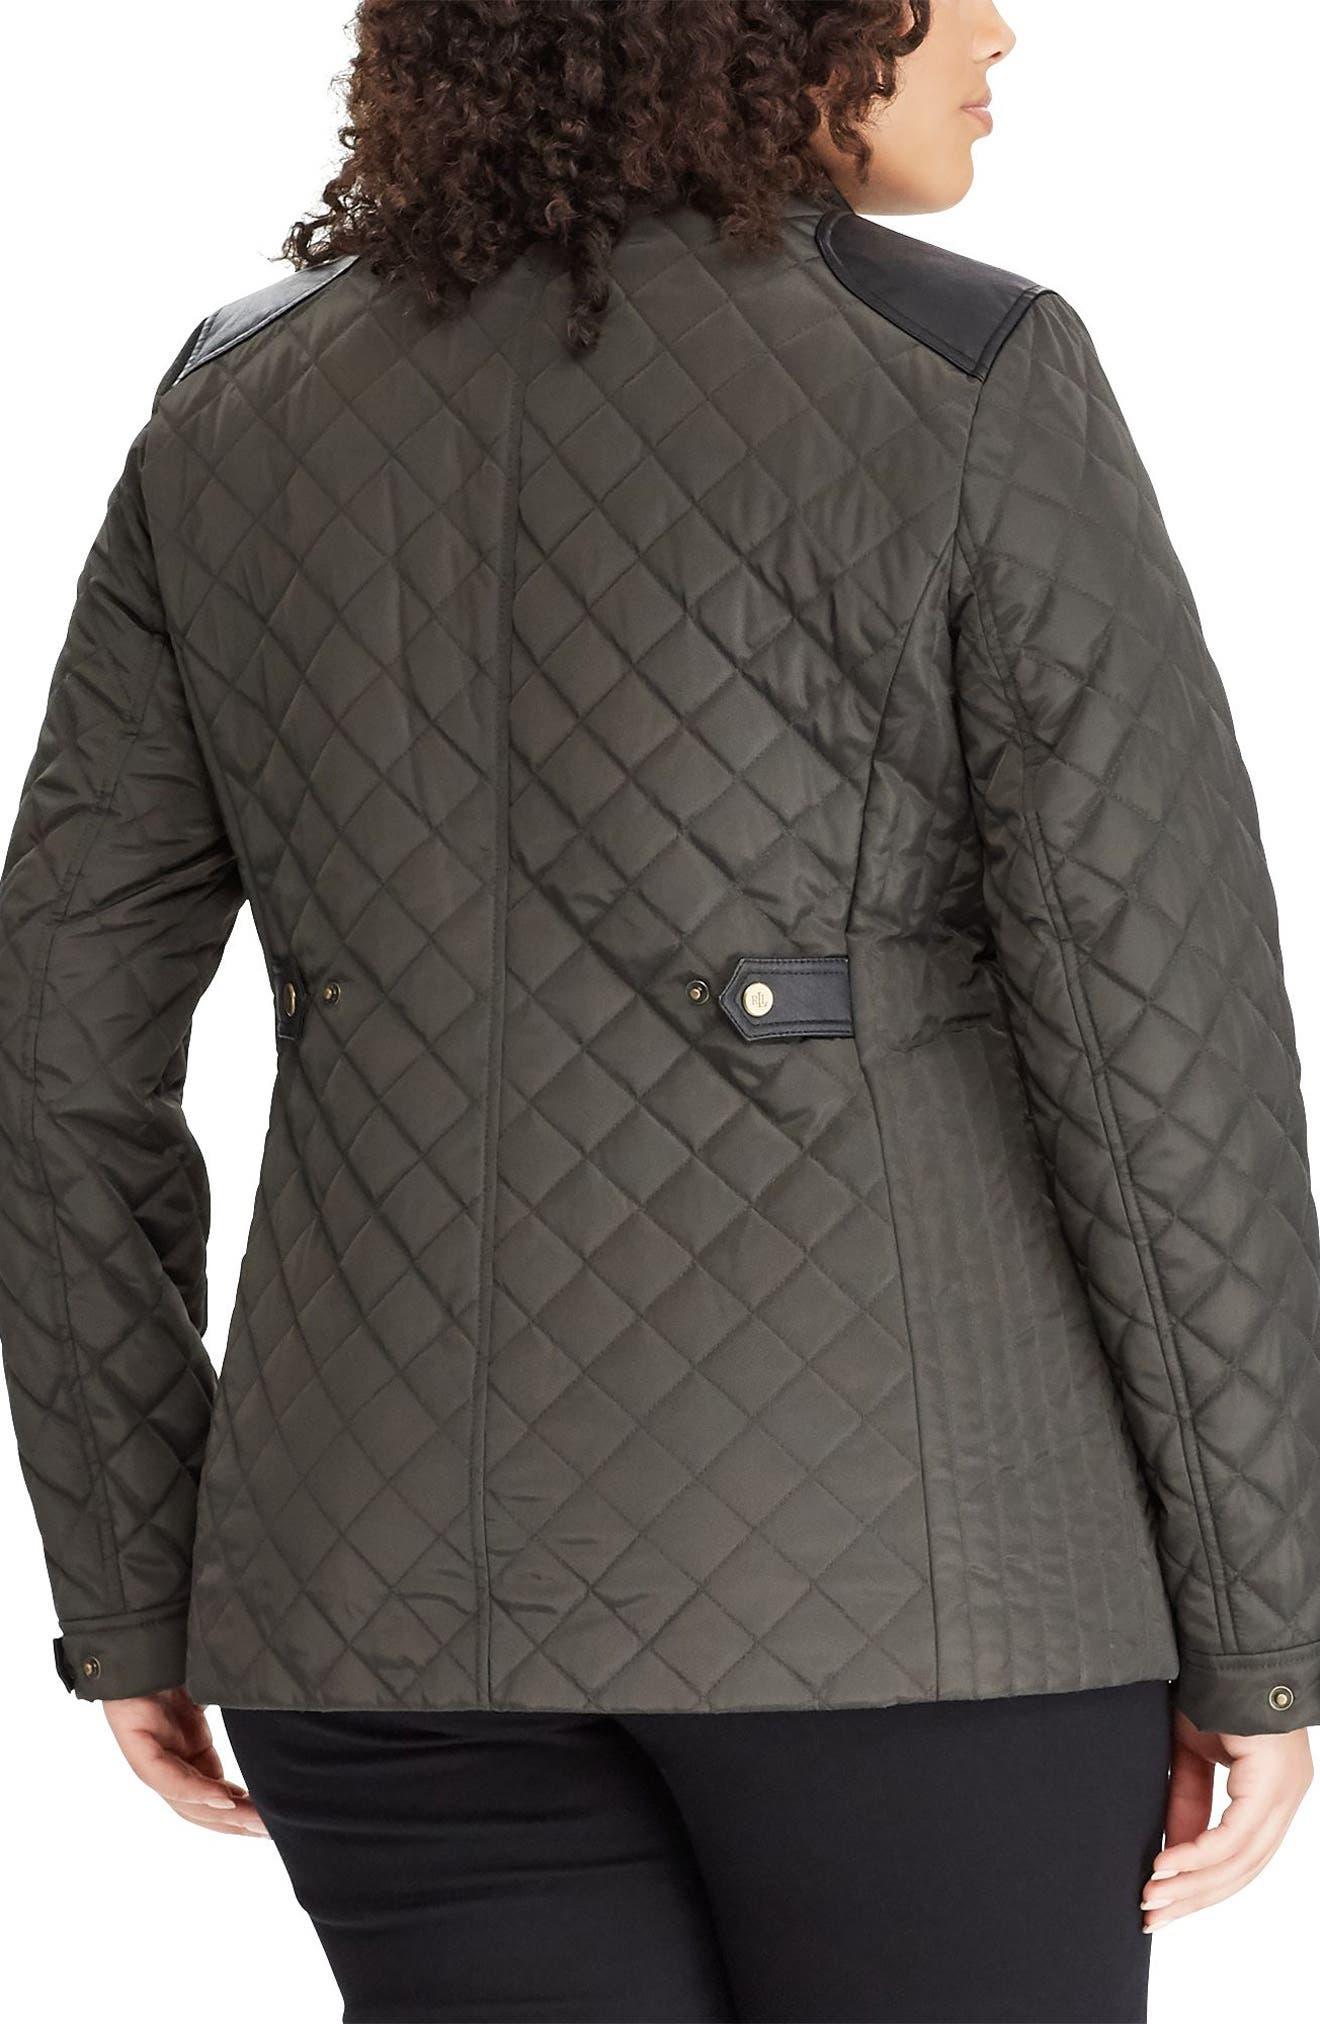 LAUREN RALPH LAUREN,                             Quilted Jacket with Faux Leather Trim,                             Alternate thumbnail 2, color,                             300